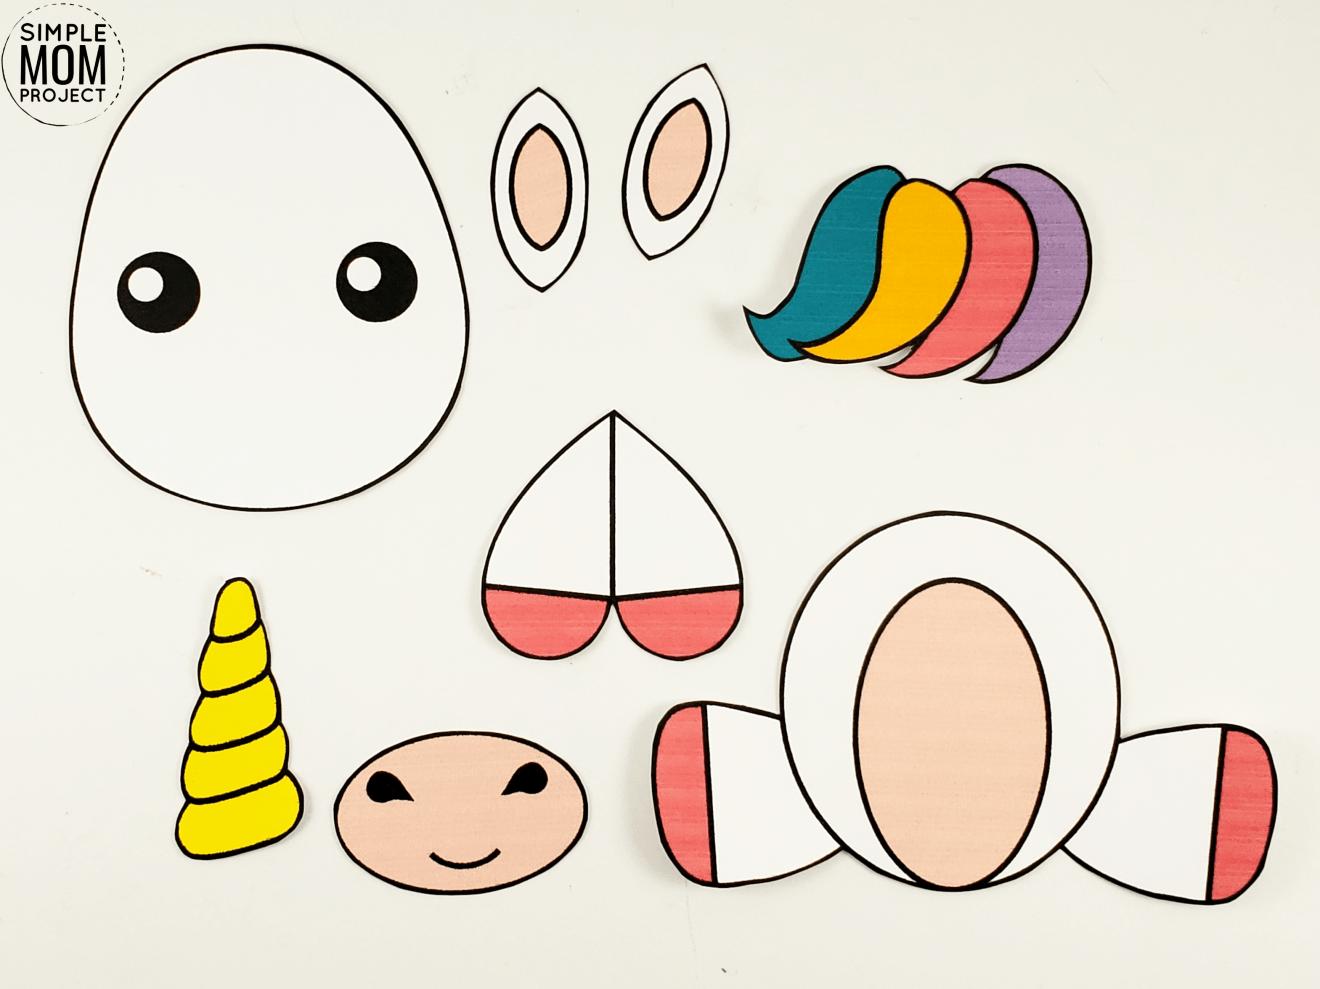 Free Printable Unicorn Craft for Kids - Simple Mom Project #unicorncrafts